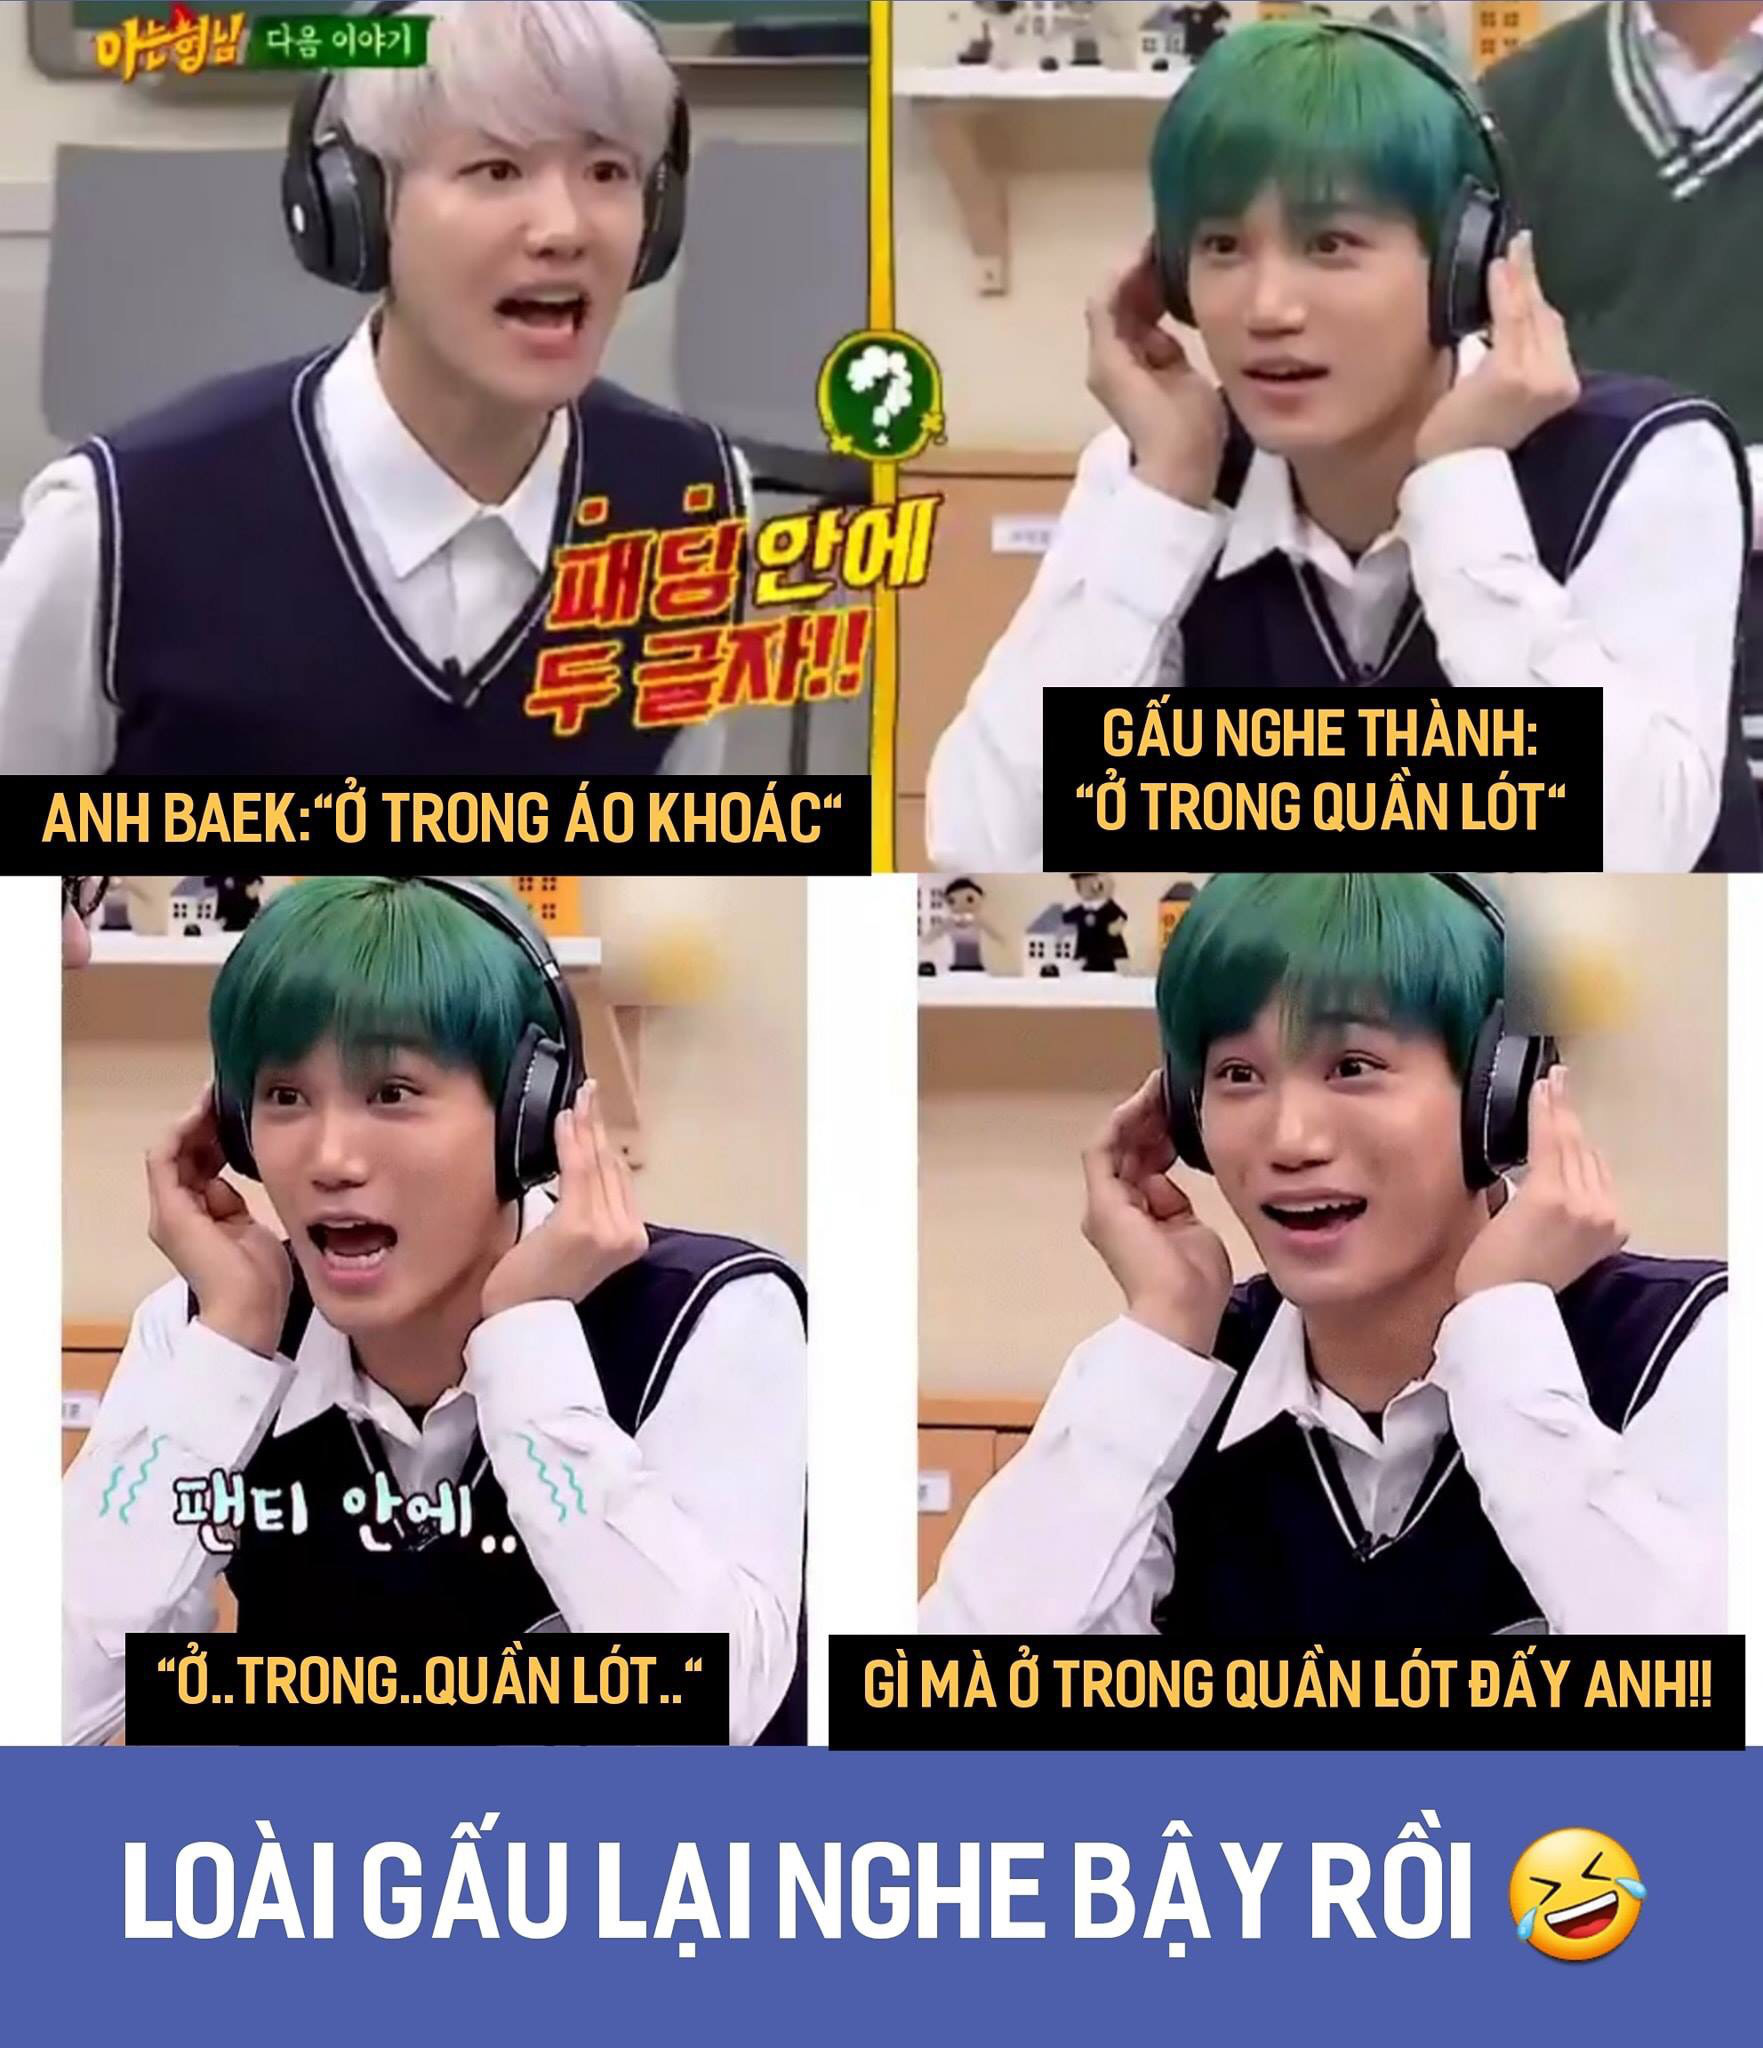 Pha nghe nhầm tai hại của Kai (Ảnh: KAIcholate - EXO Kai's Vietnam fanpage)